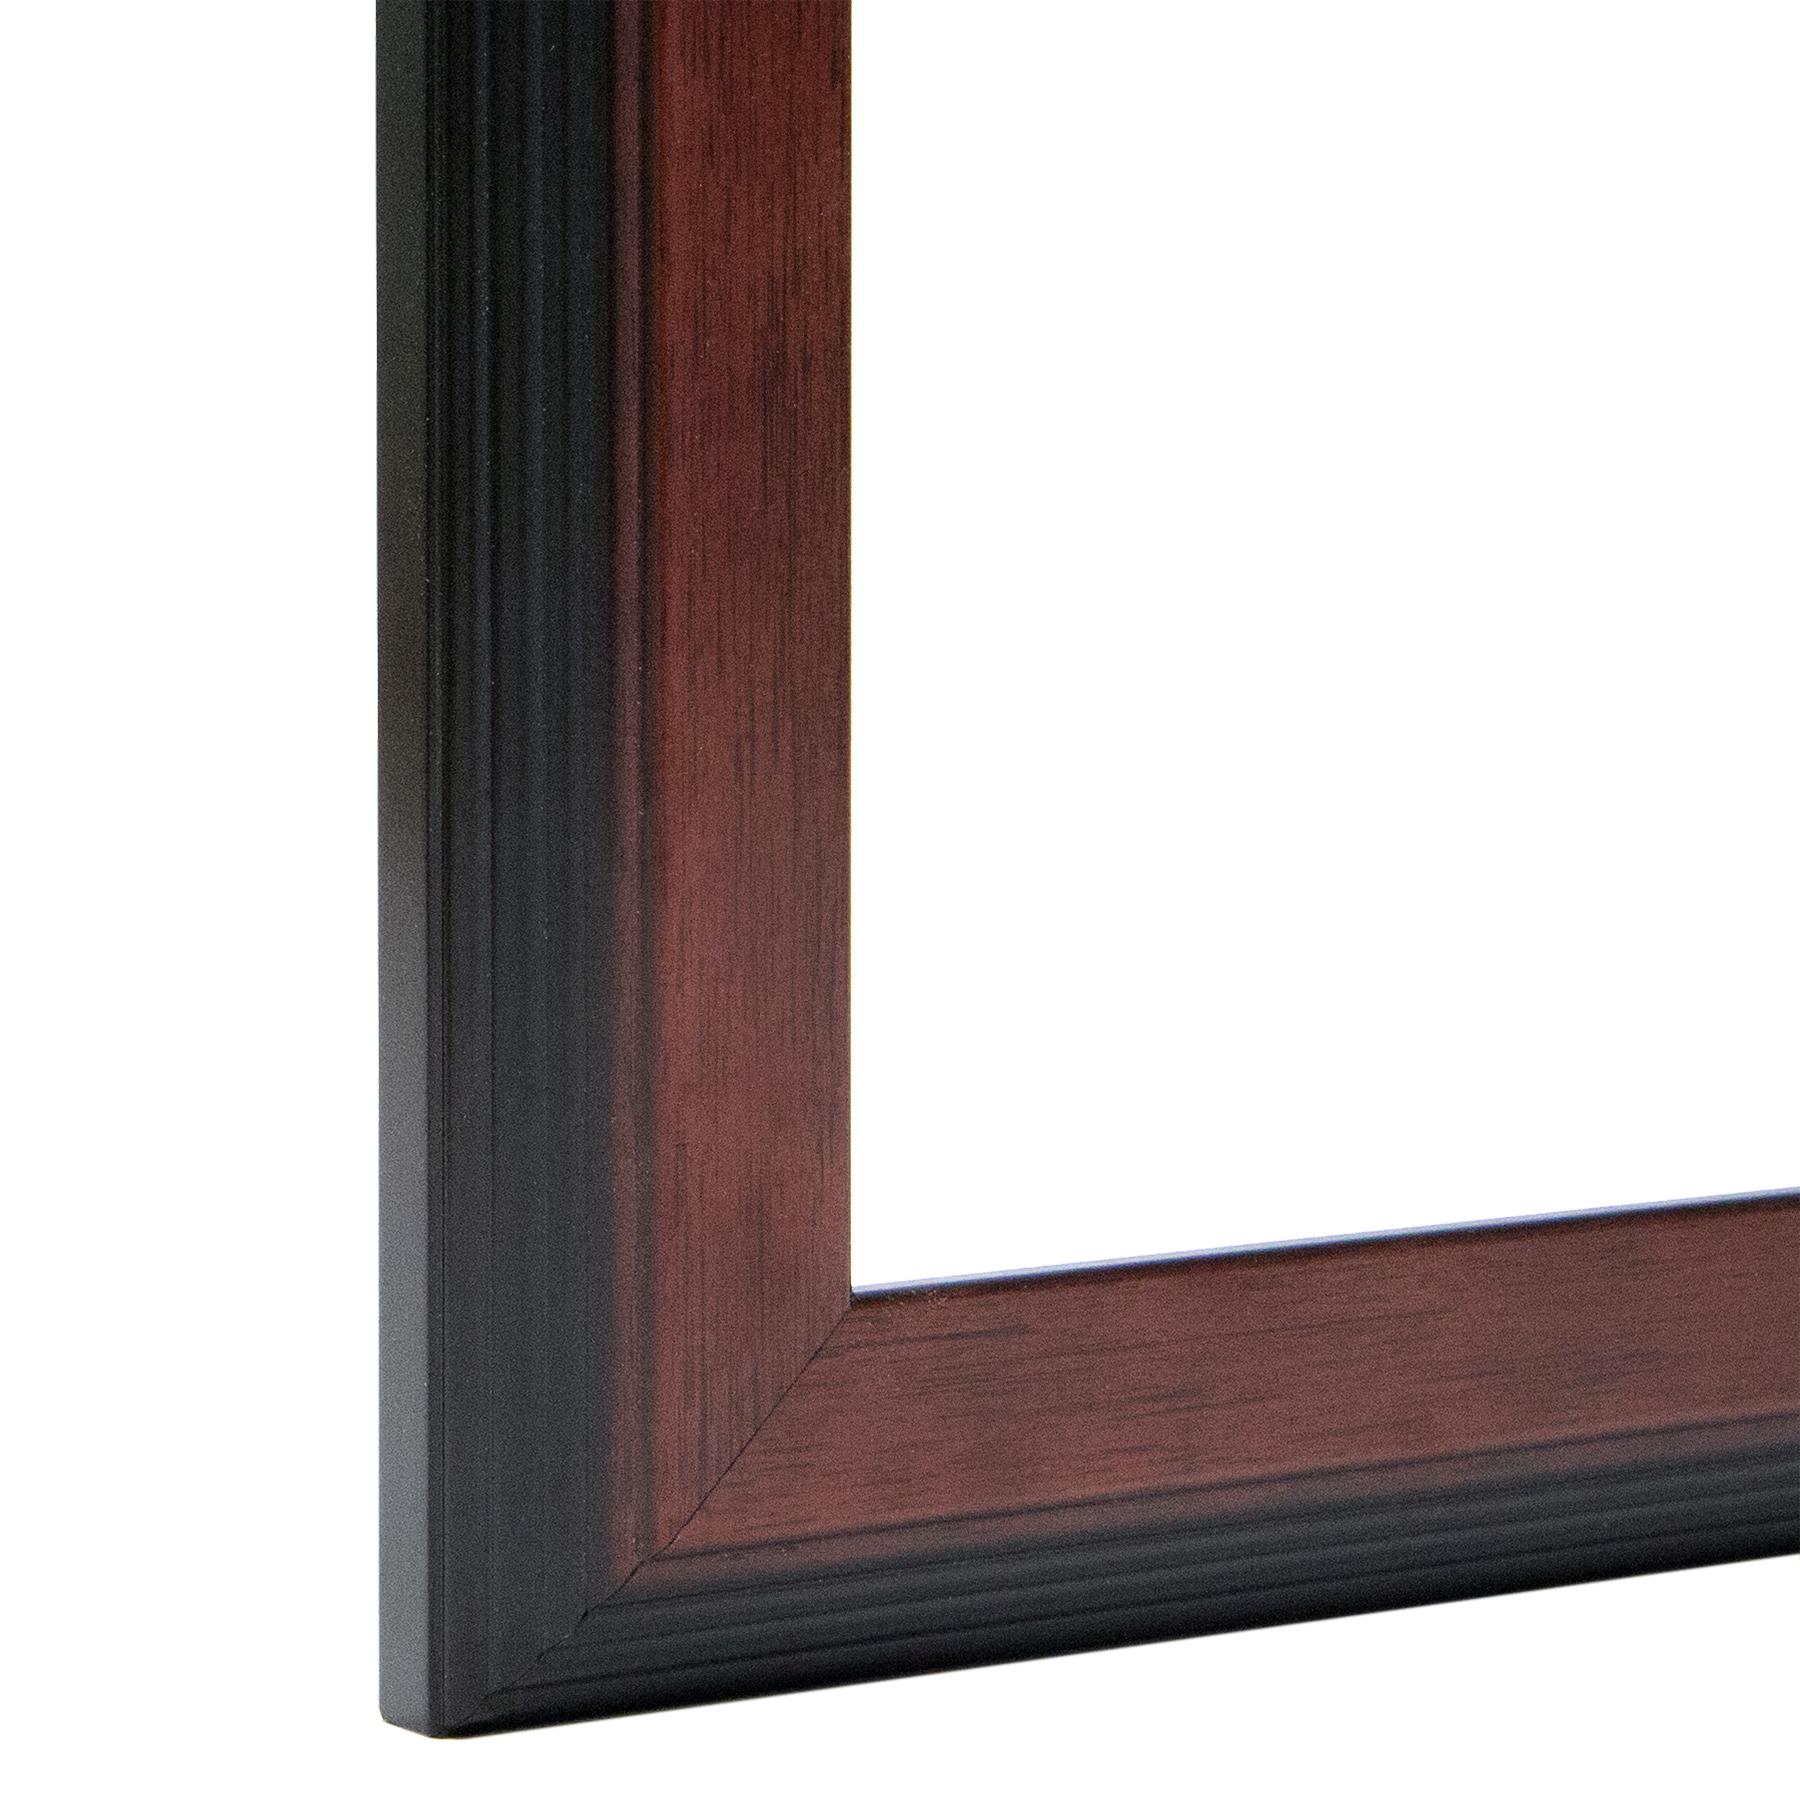 Reverse Stepped Mahogany Frame, Custom Stepped Frame I FramedIt